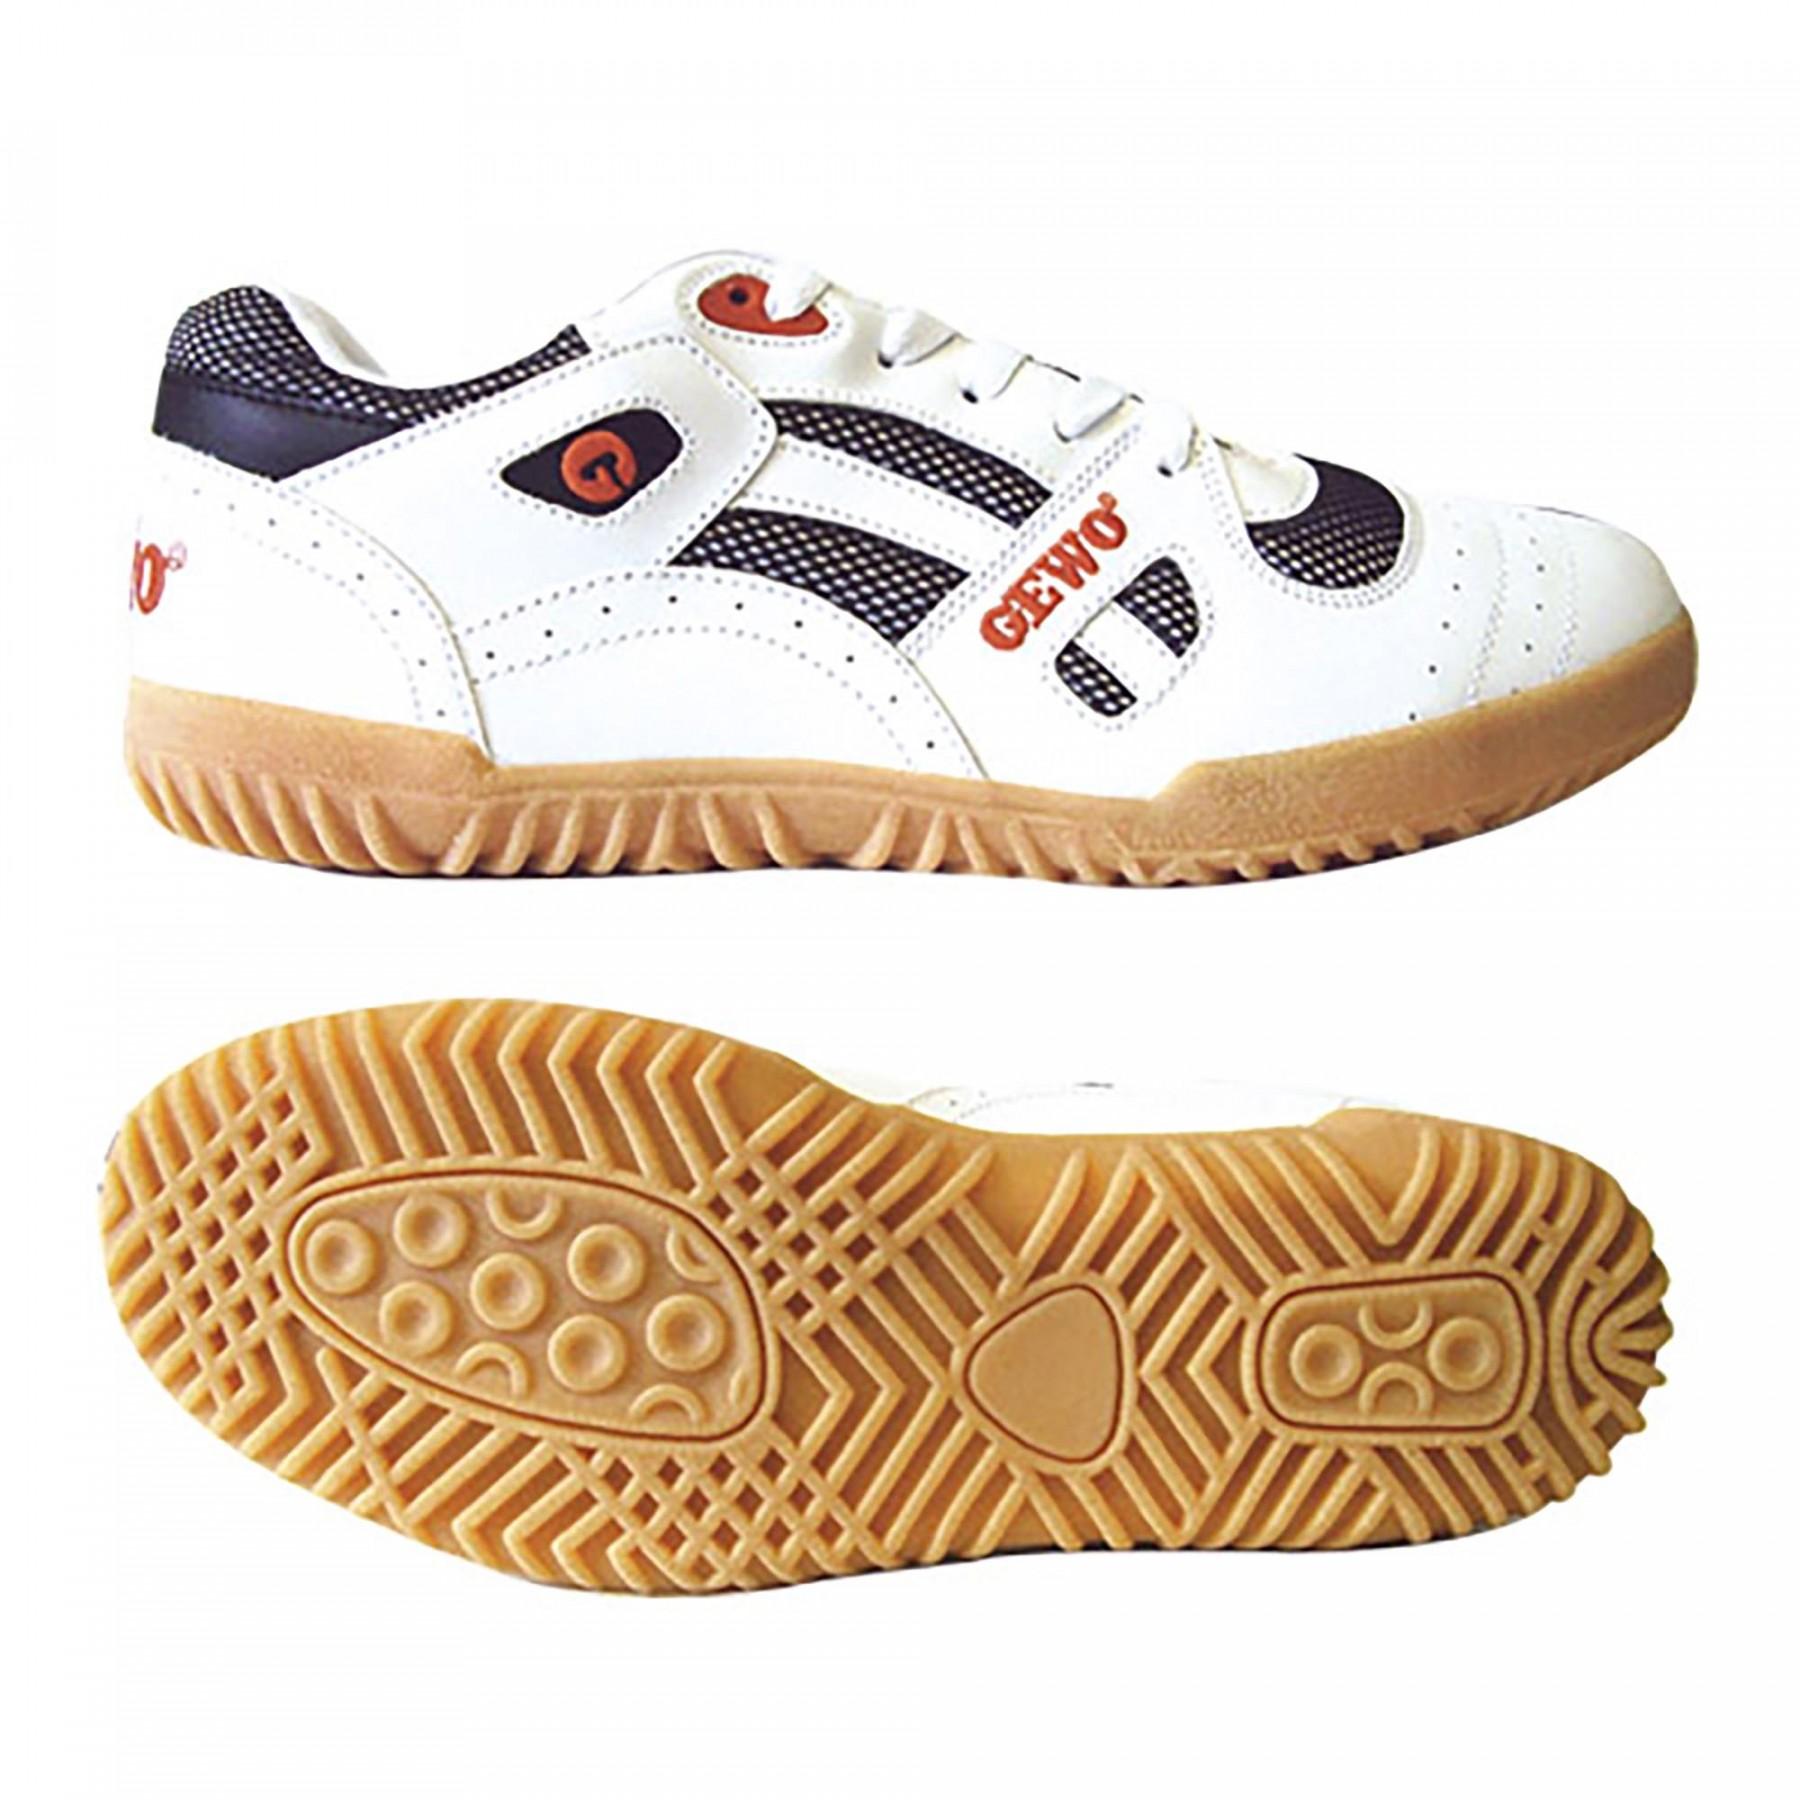 Fabulous Gewo Tt Super Table Tennis Shoes Interior Design Ideas Oteneahmetsinanyavuzinfo